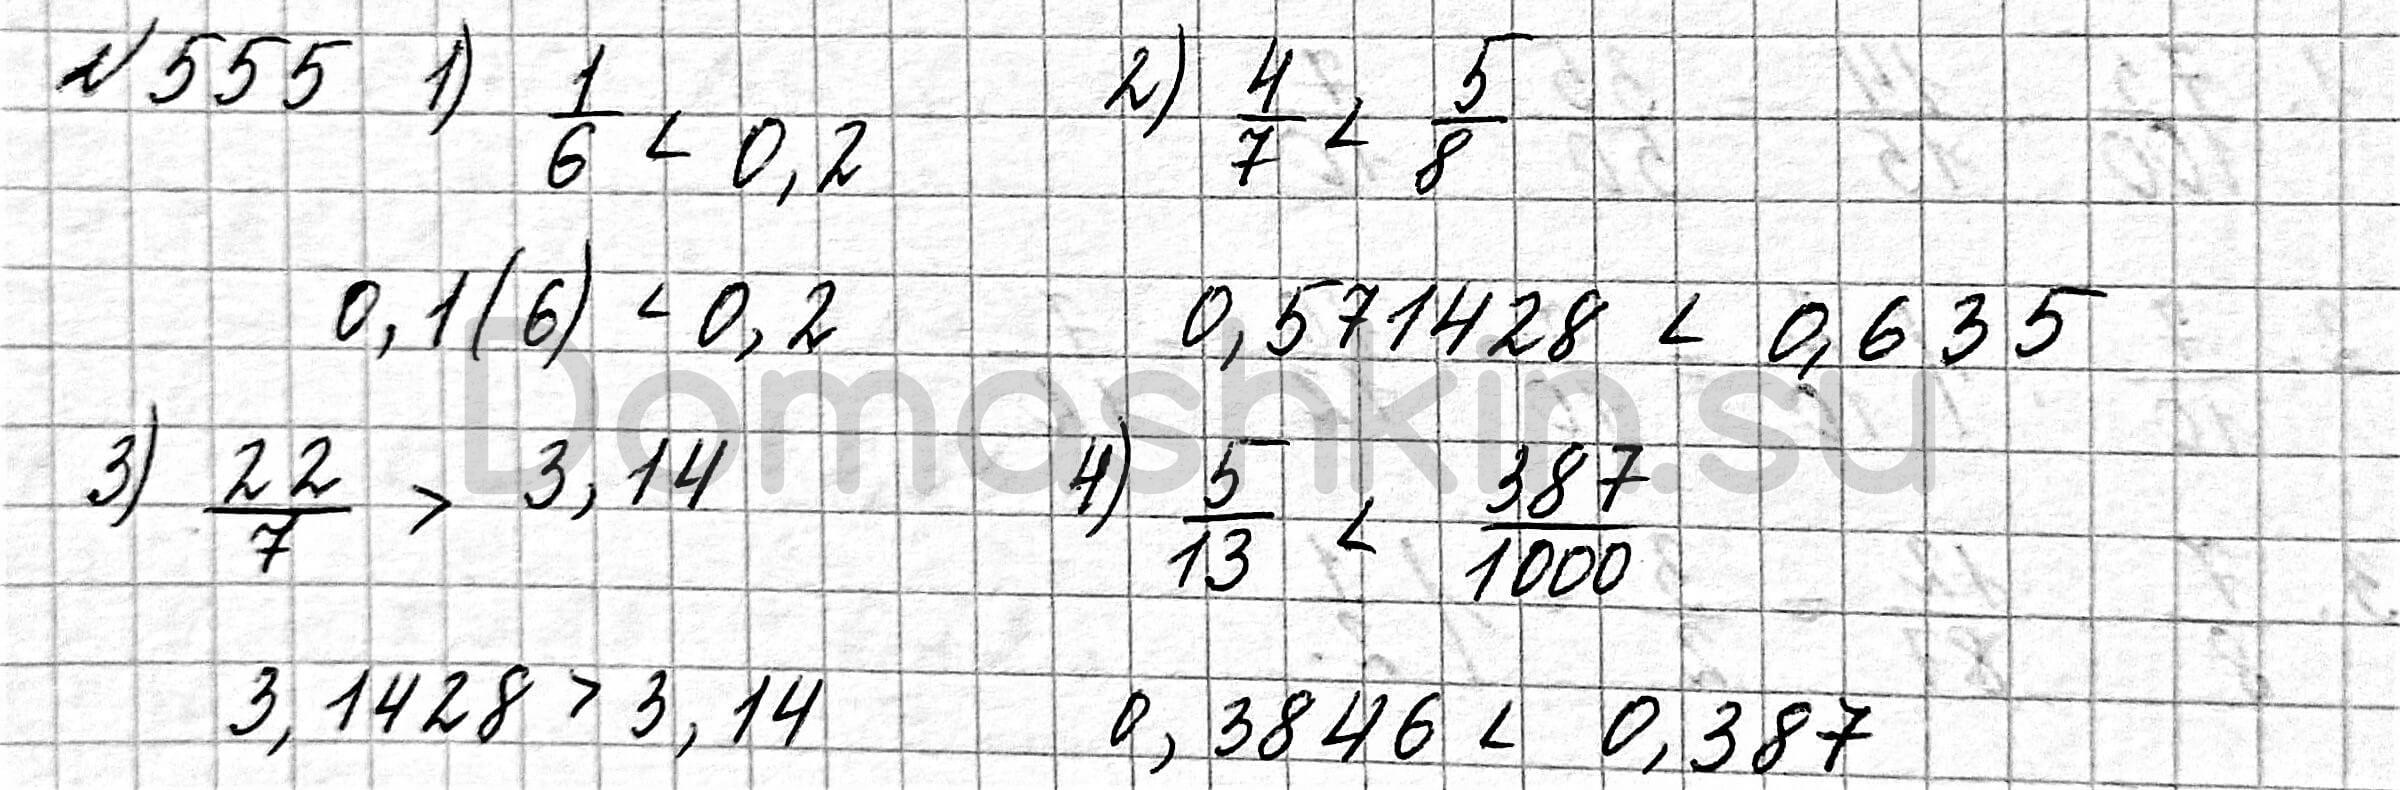 Математика 6 класс учебник Мерзляк номер 555 решение